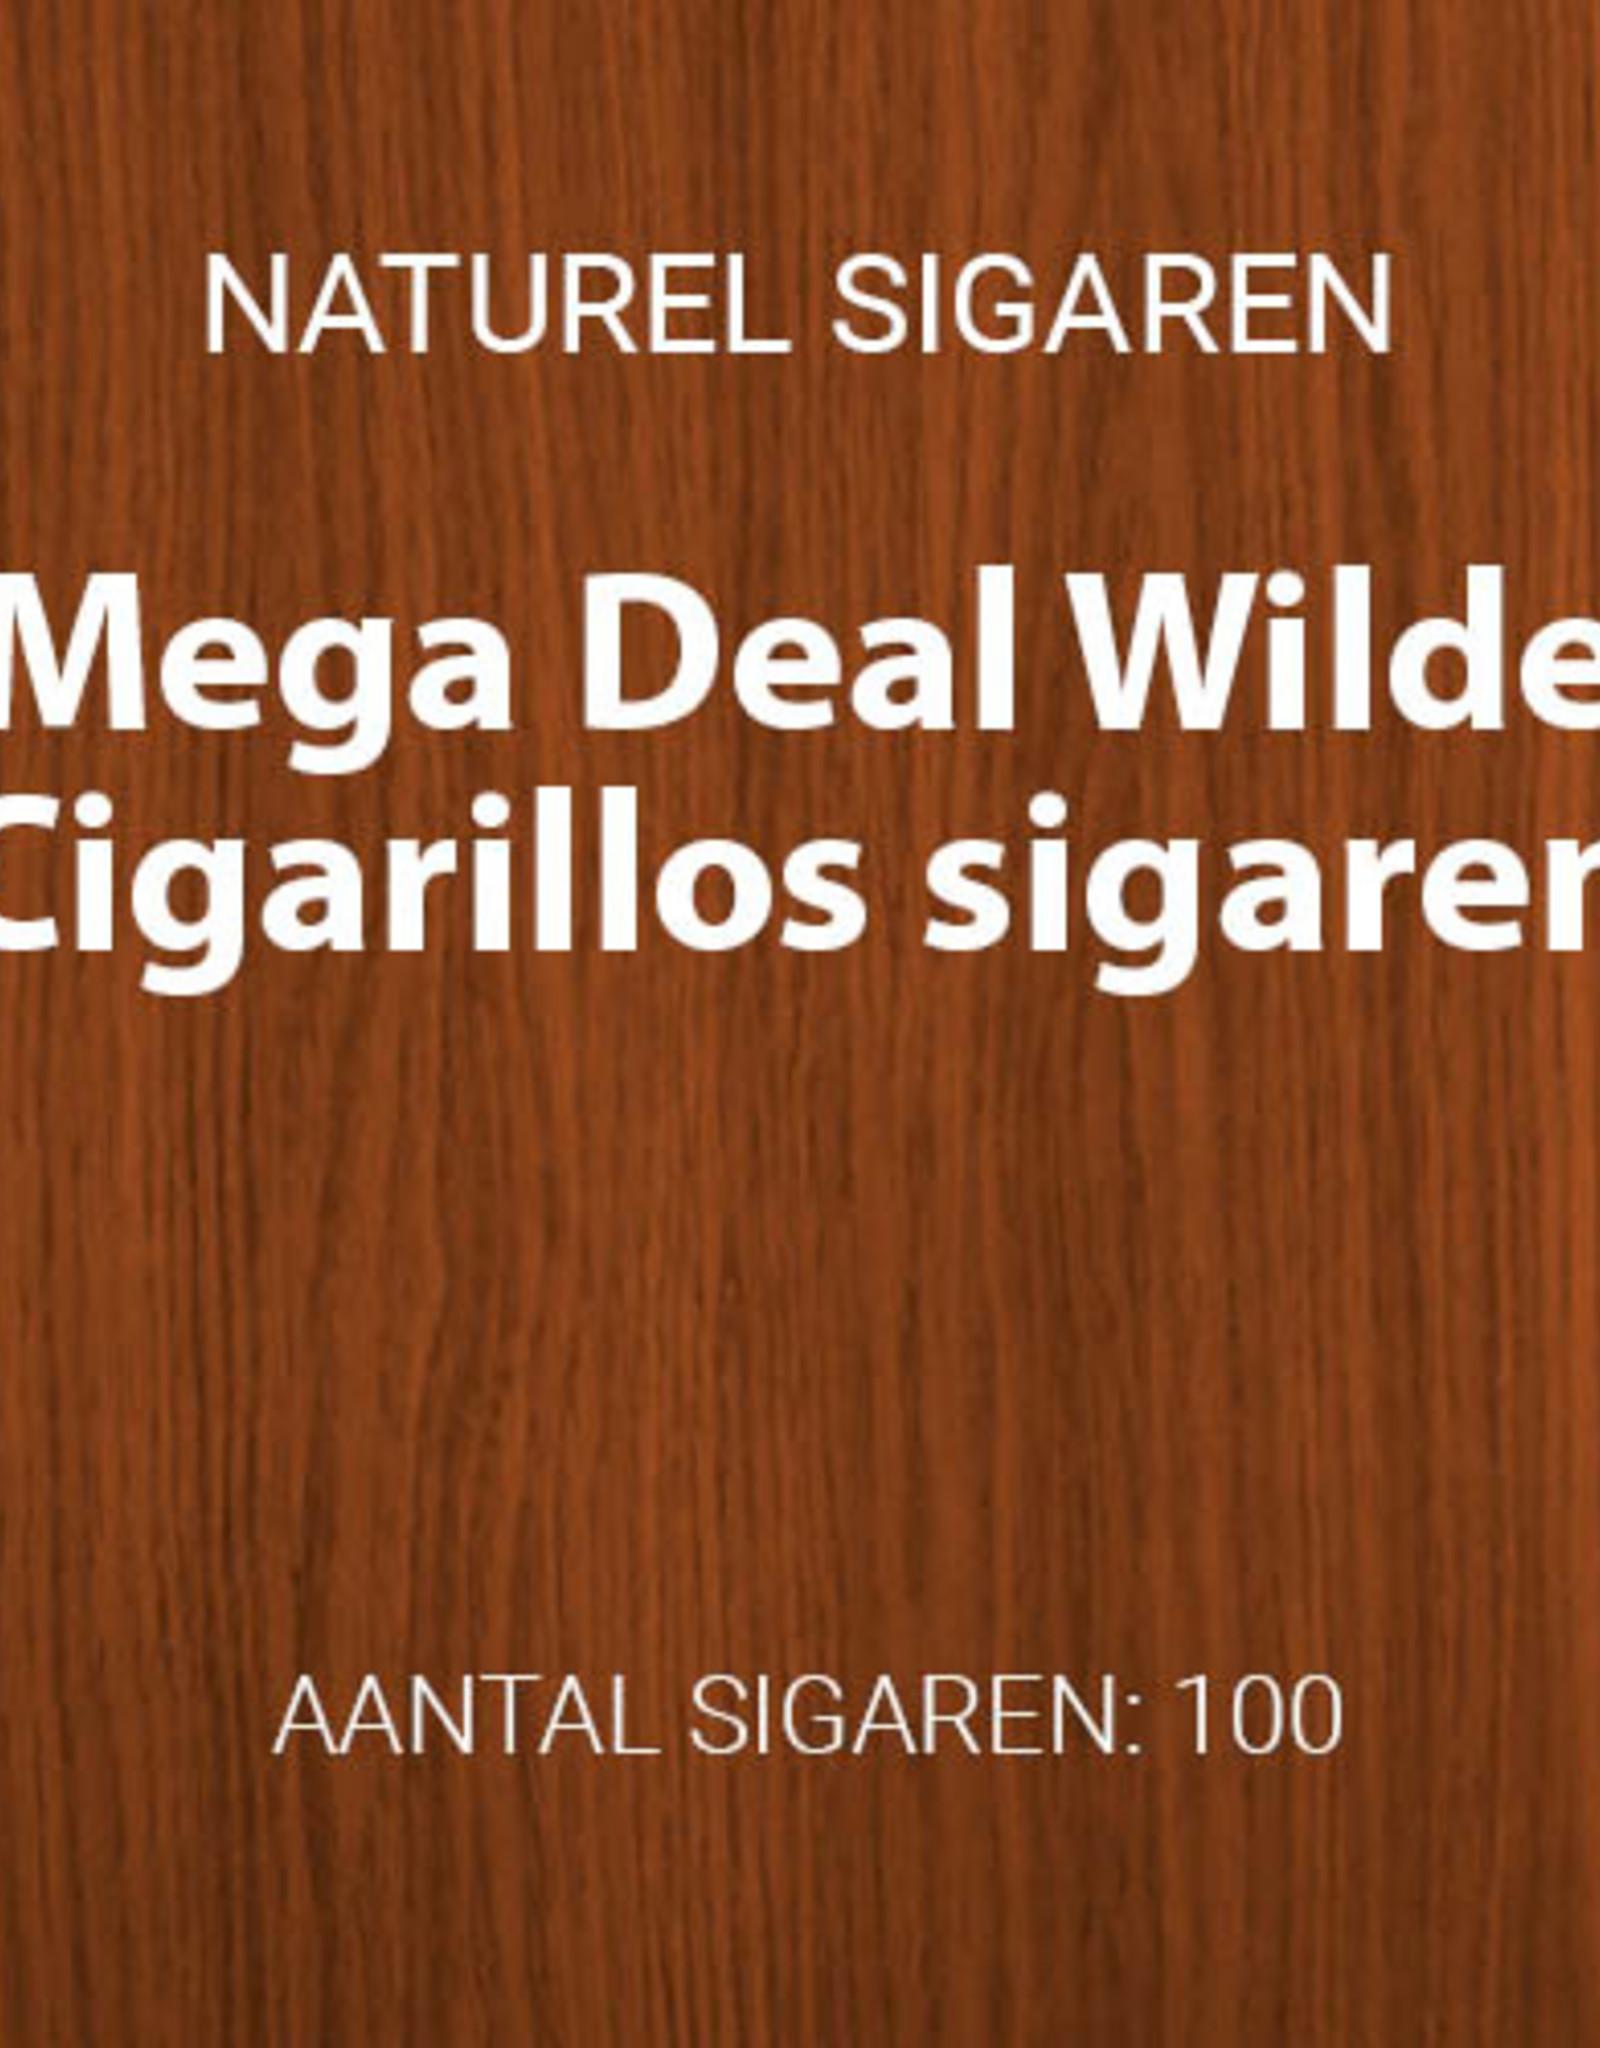 Mega Deal Wilde Cigarillo's